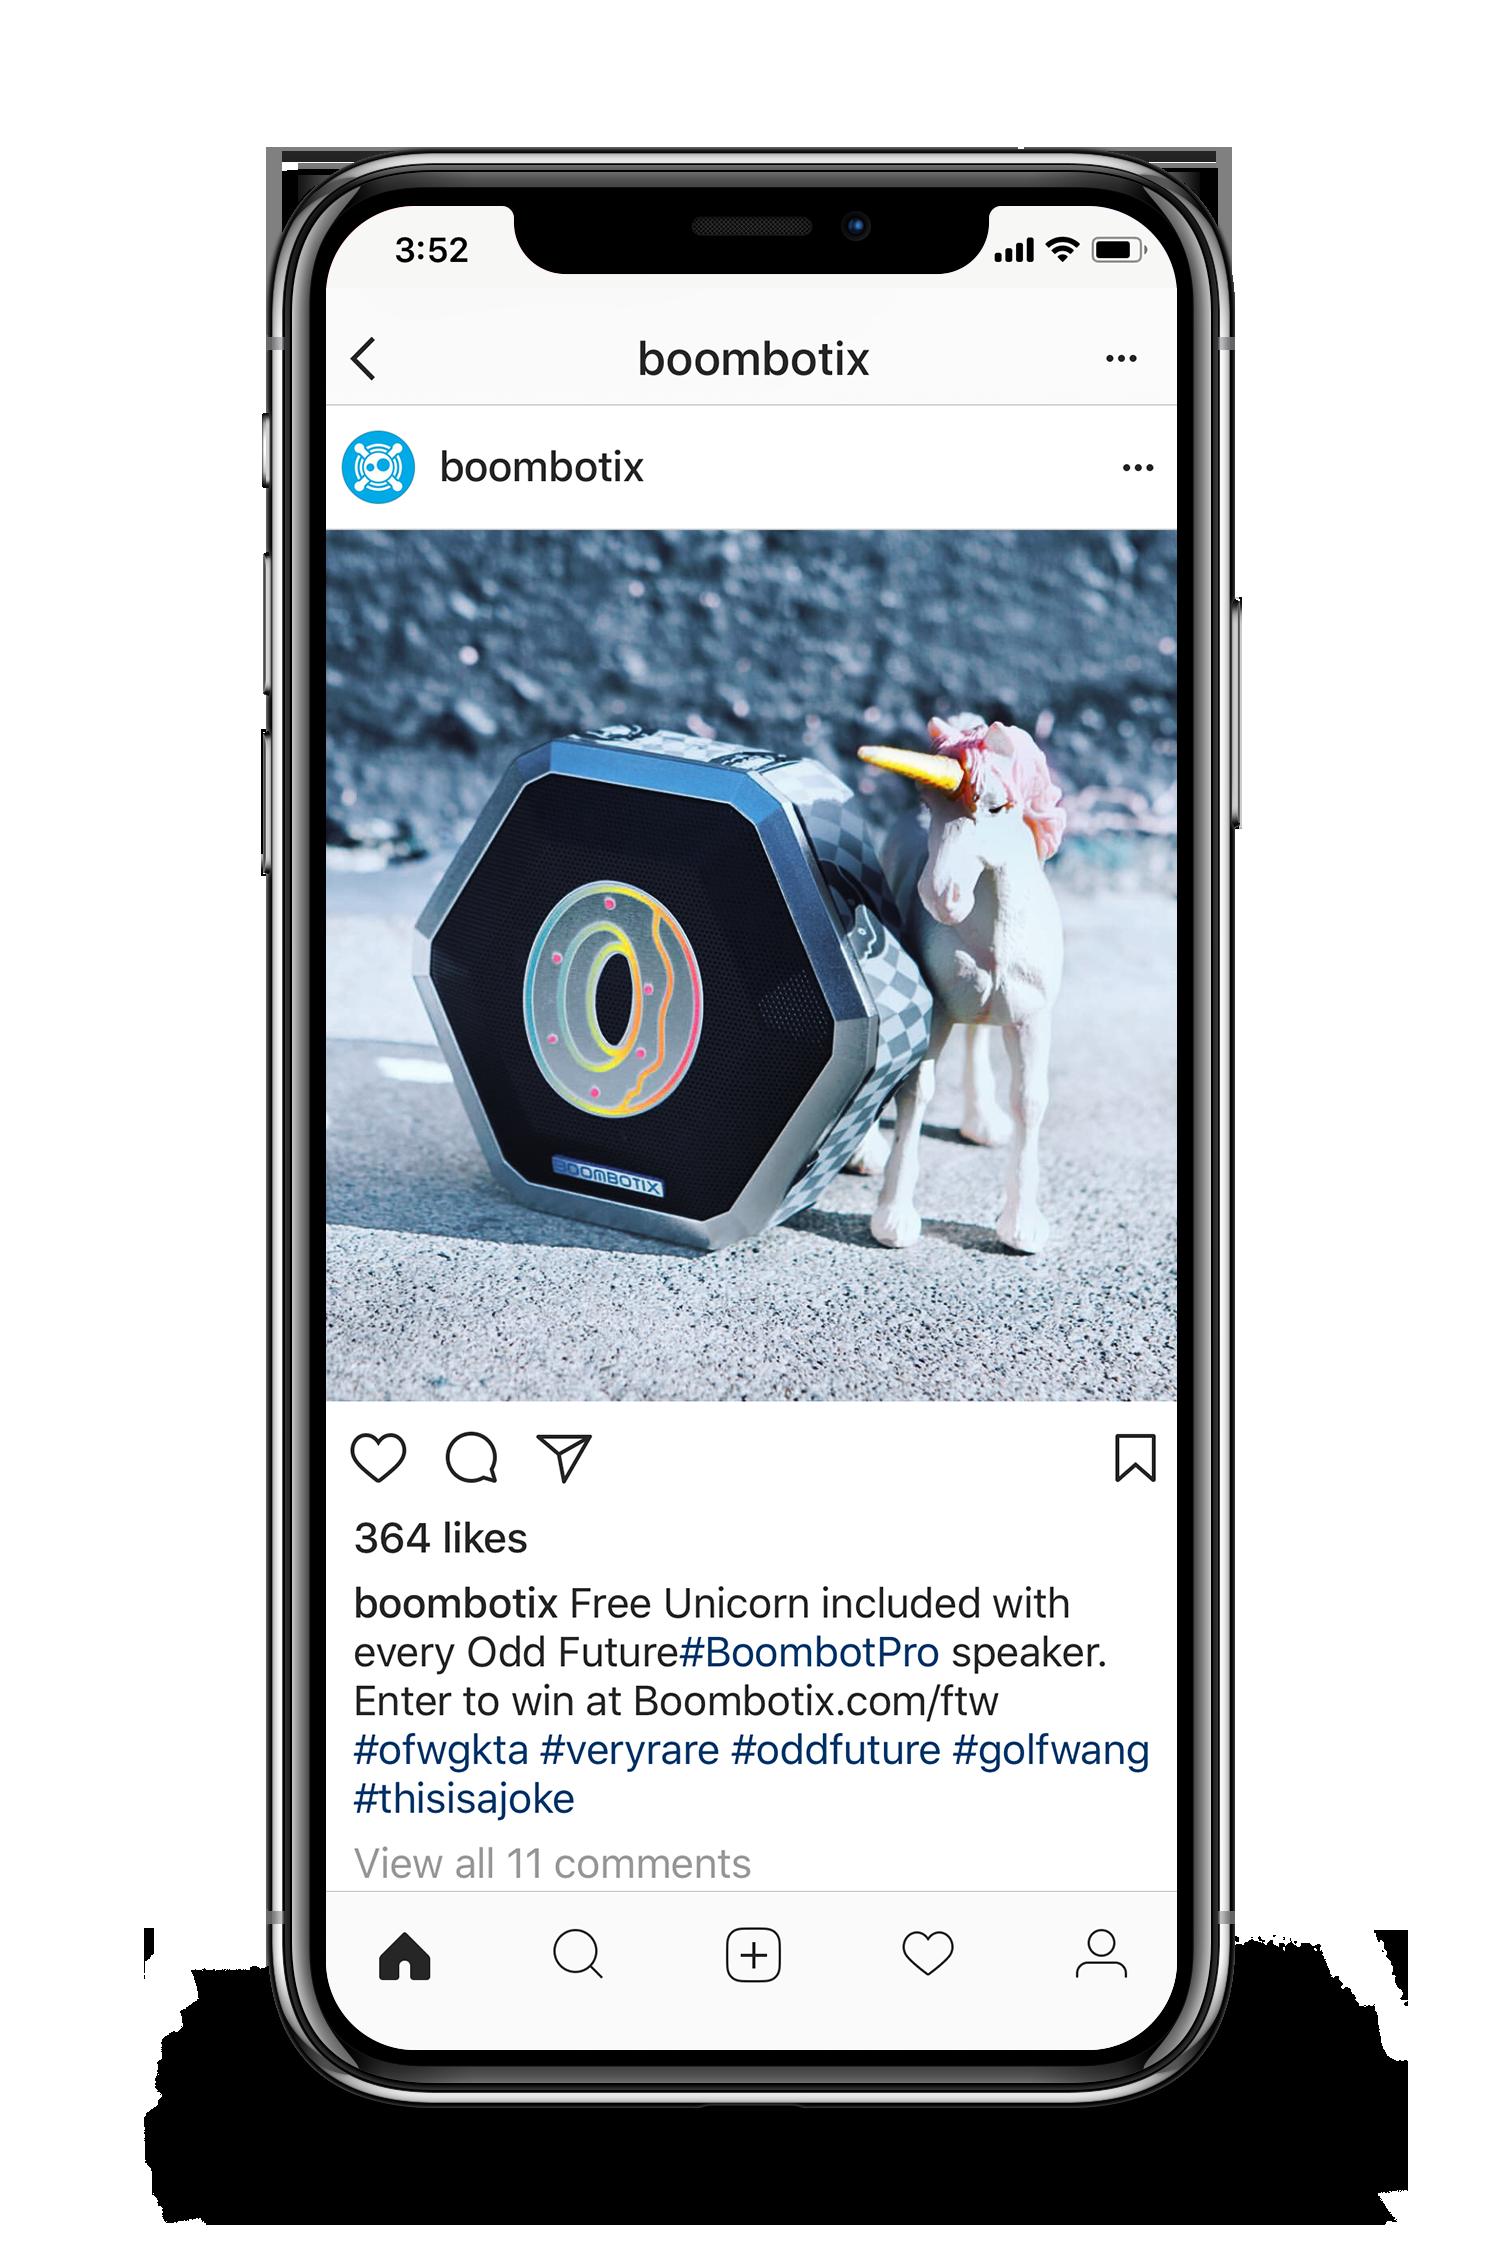 Odd future and boombotix speaker instagram advertisements displayed on smartphone